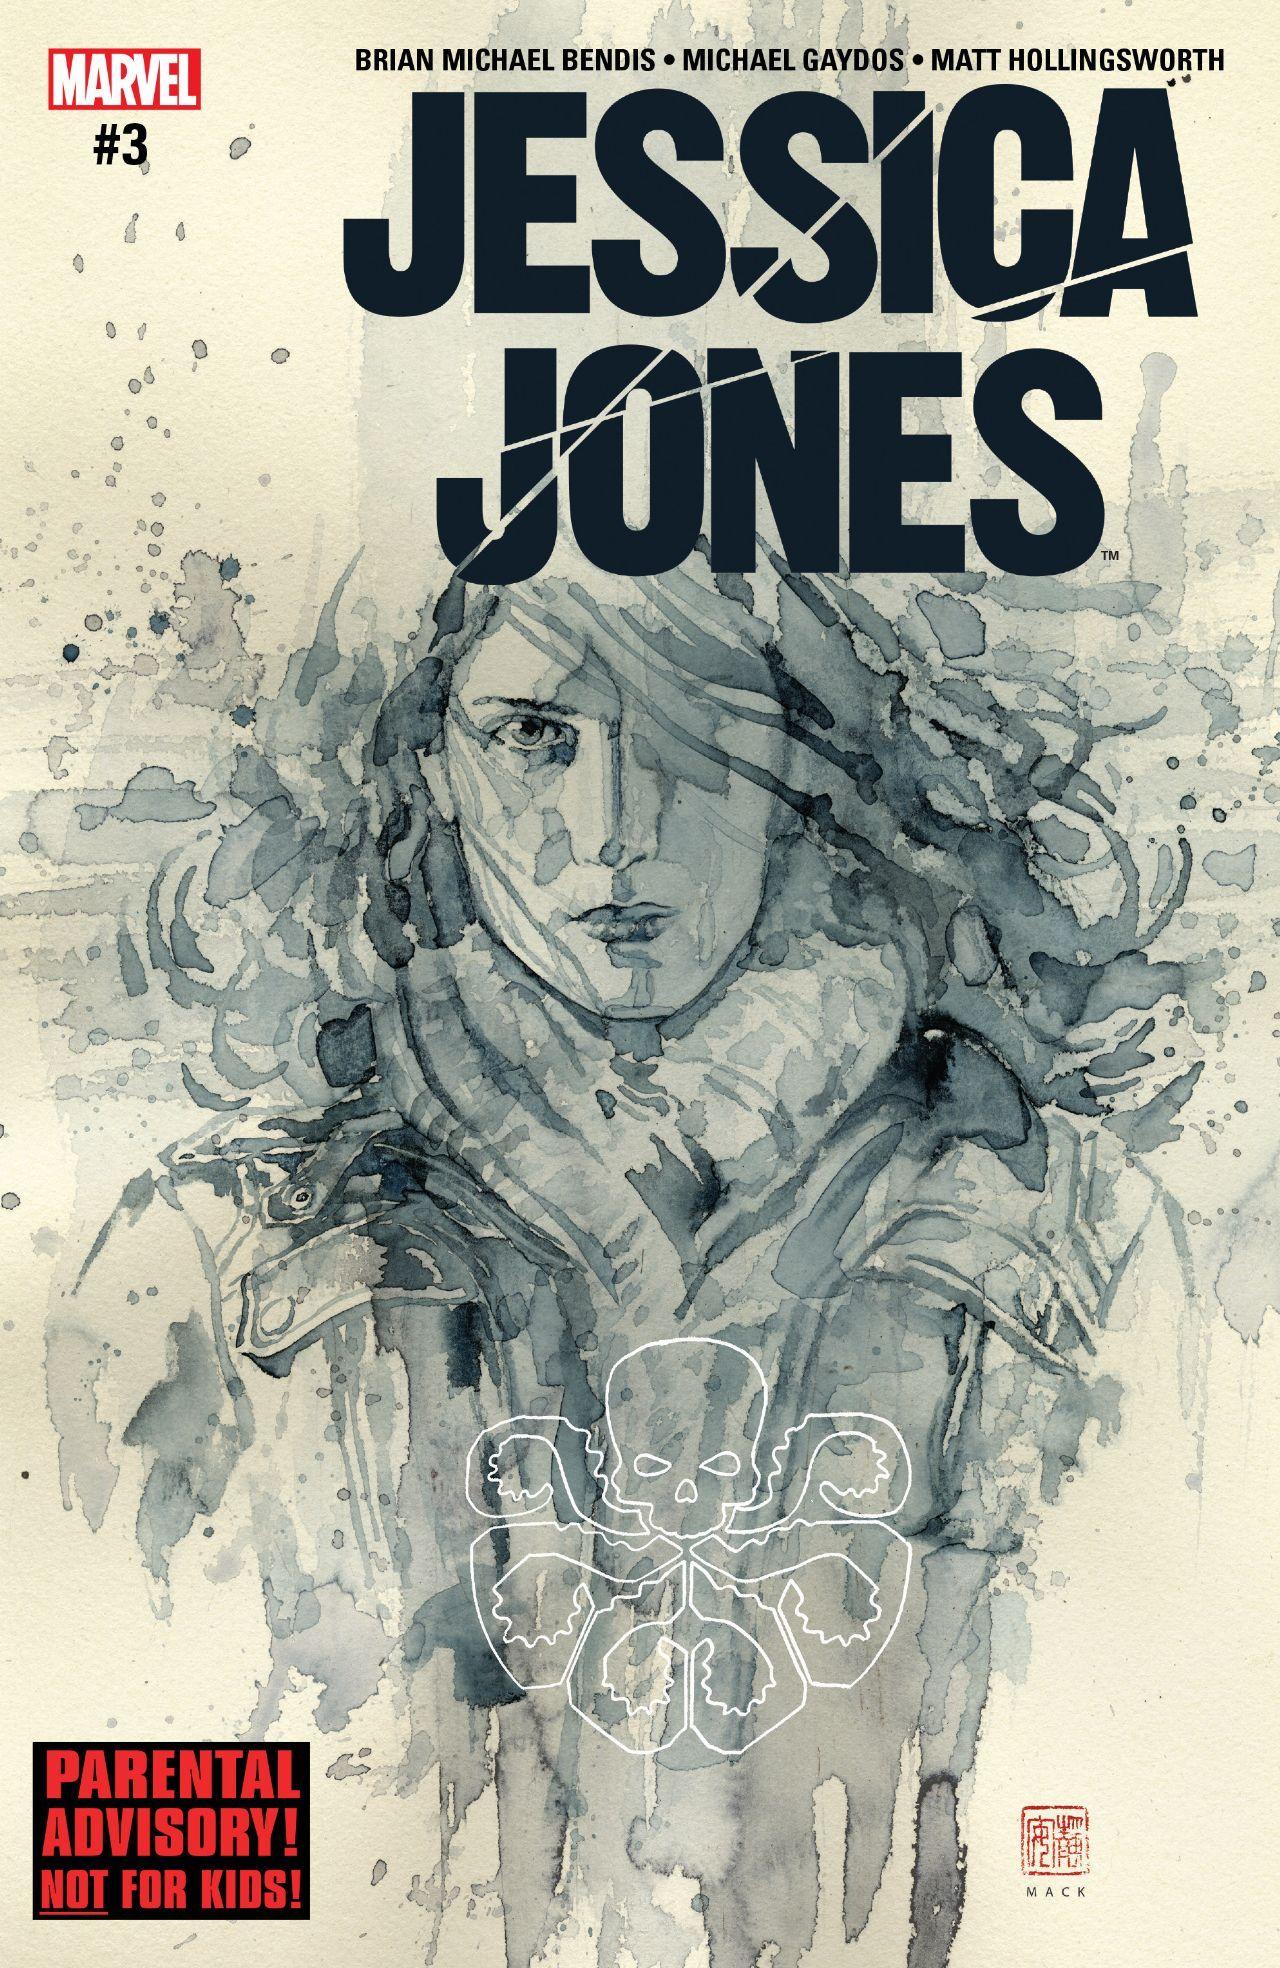 Jessica Jones (2016) #3 #Marvel @marvel @marvelofficial #JessicaJones (Cover Artist: David Mack) Release Date: 12/14/2016